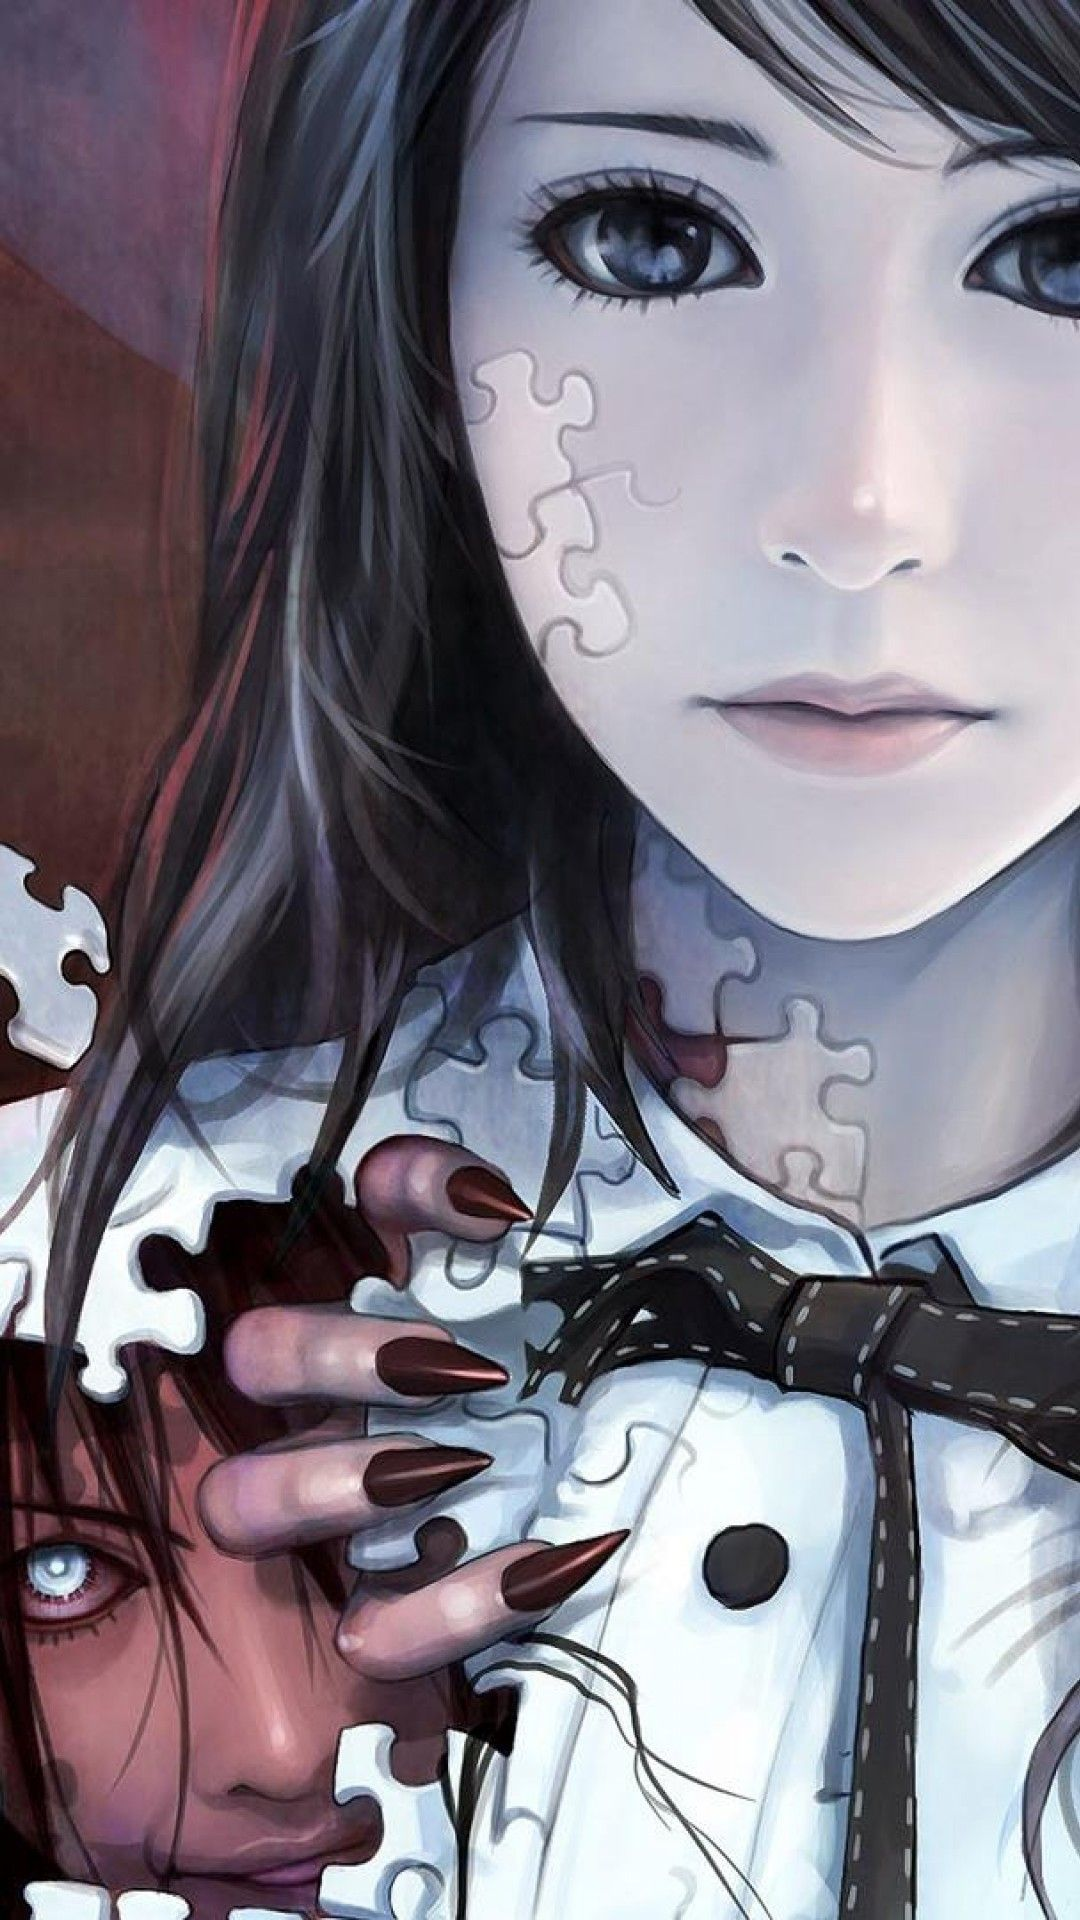 Wallpaper Anime Girl Keren 3d gambar ke 3